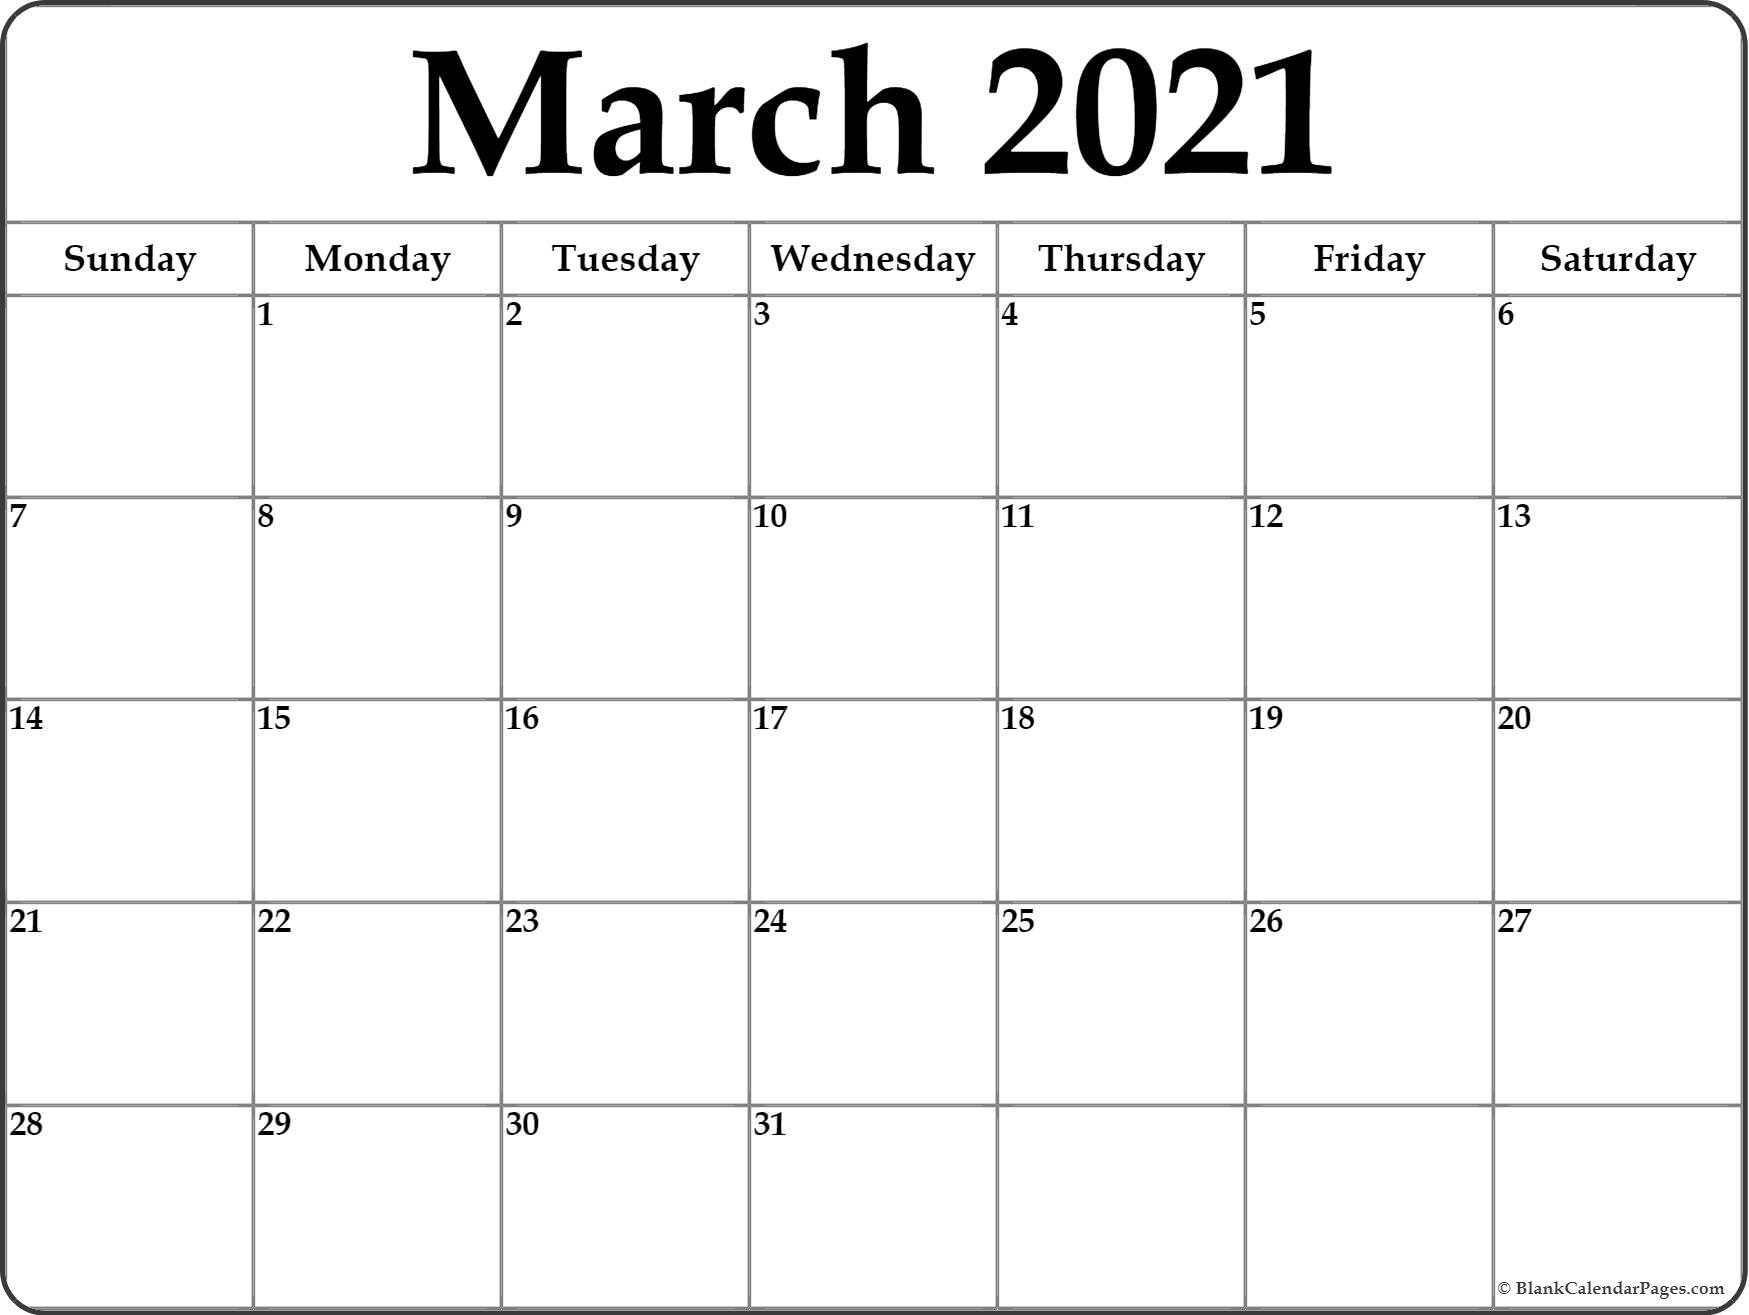 March 2021 Blank Calendar Collection. July 2021 Vertical Calendar